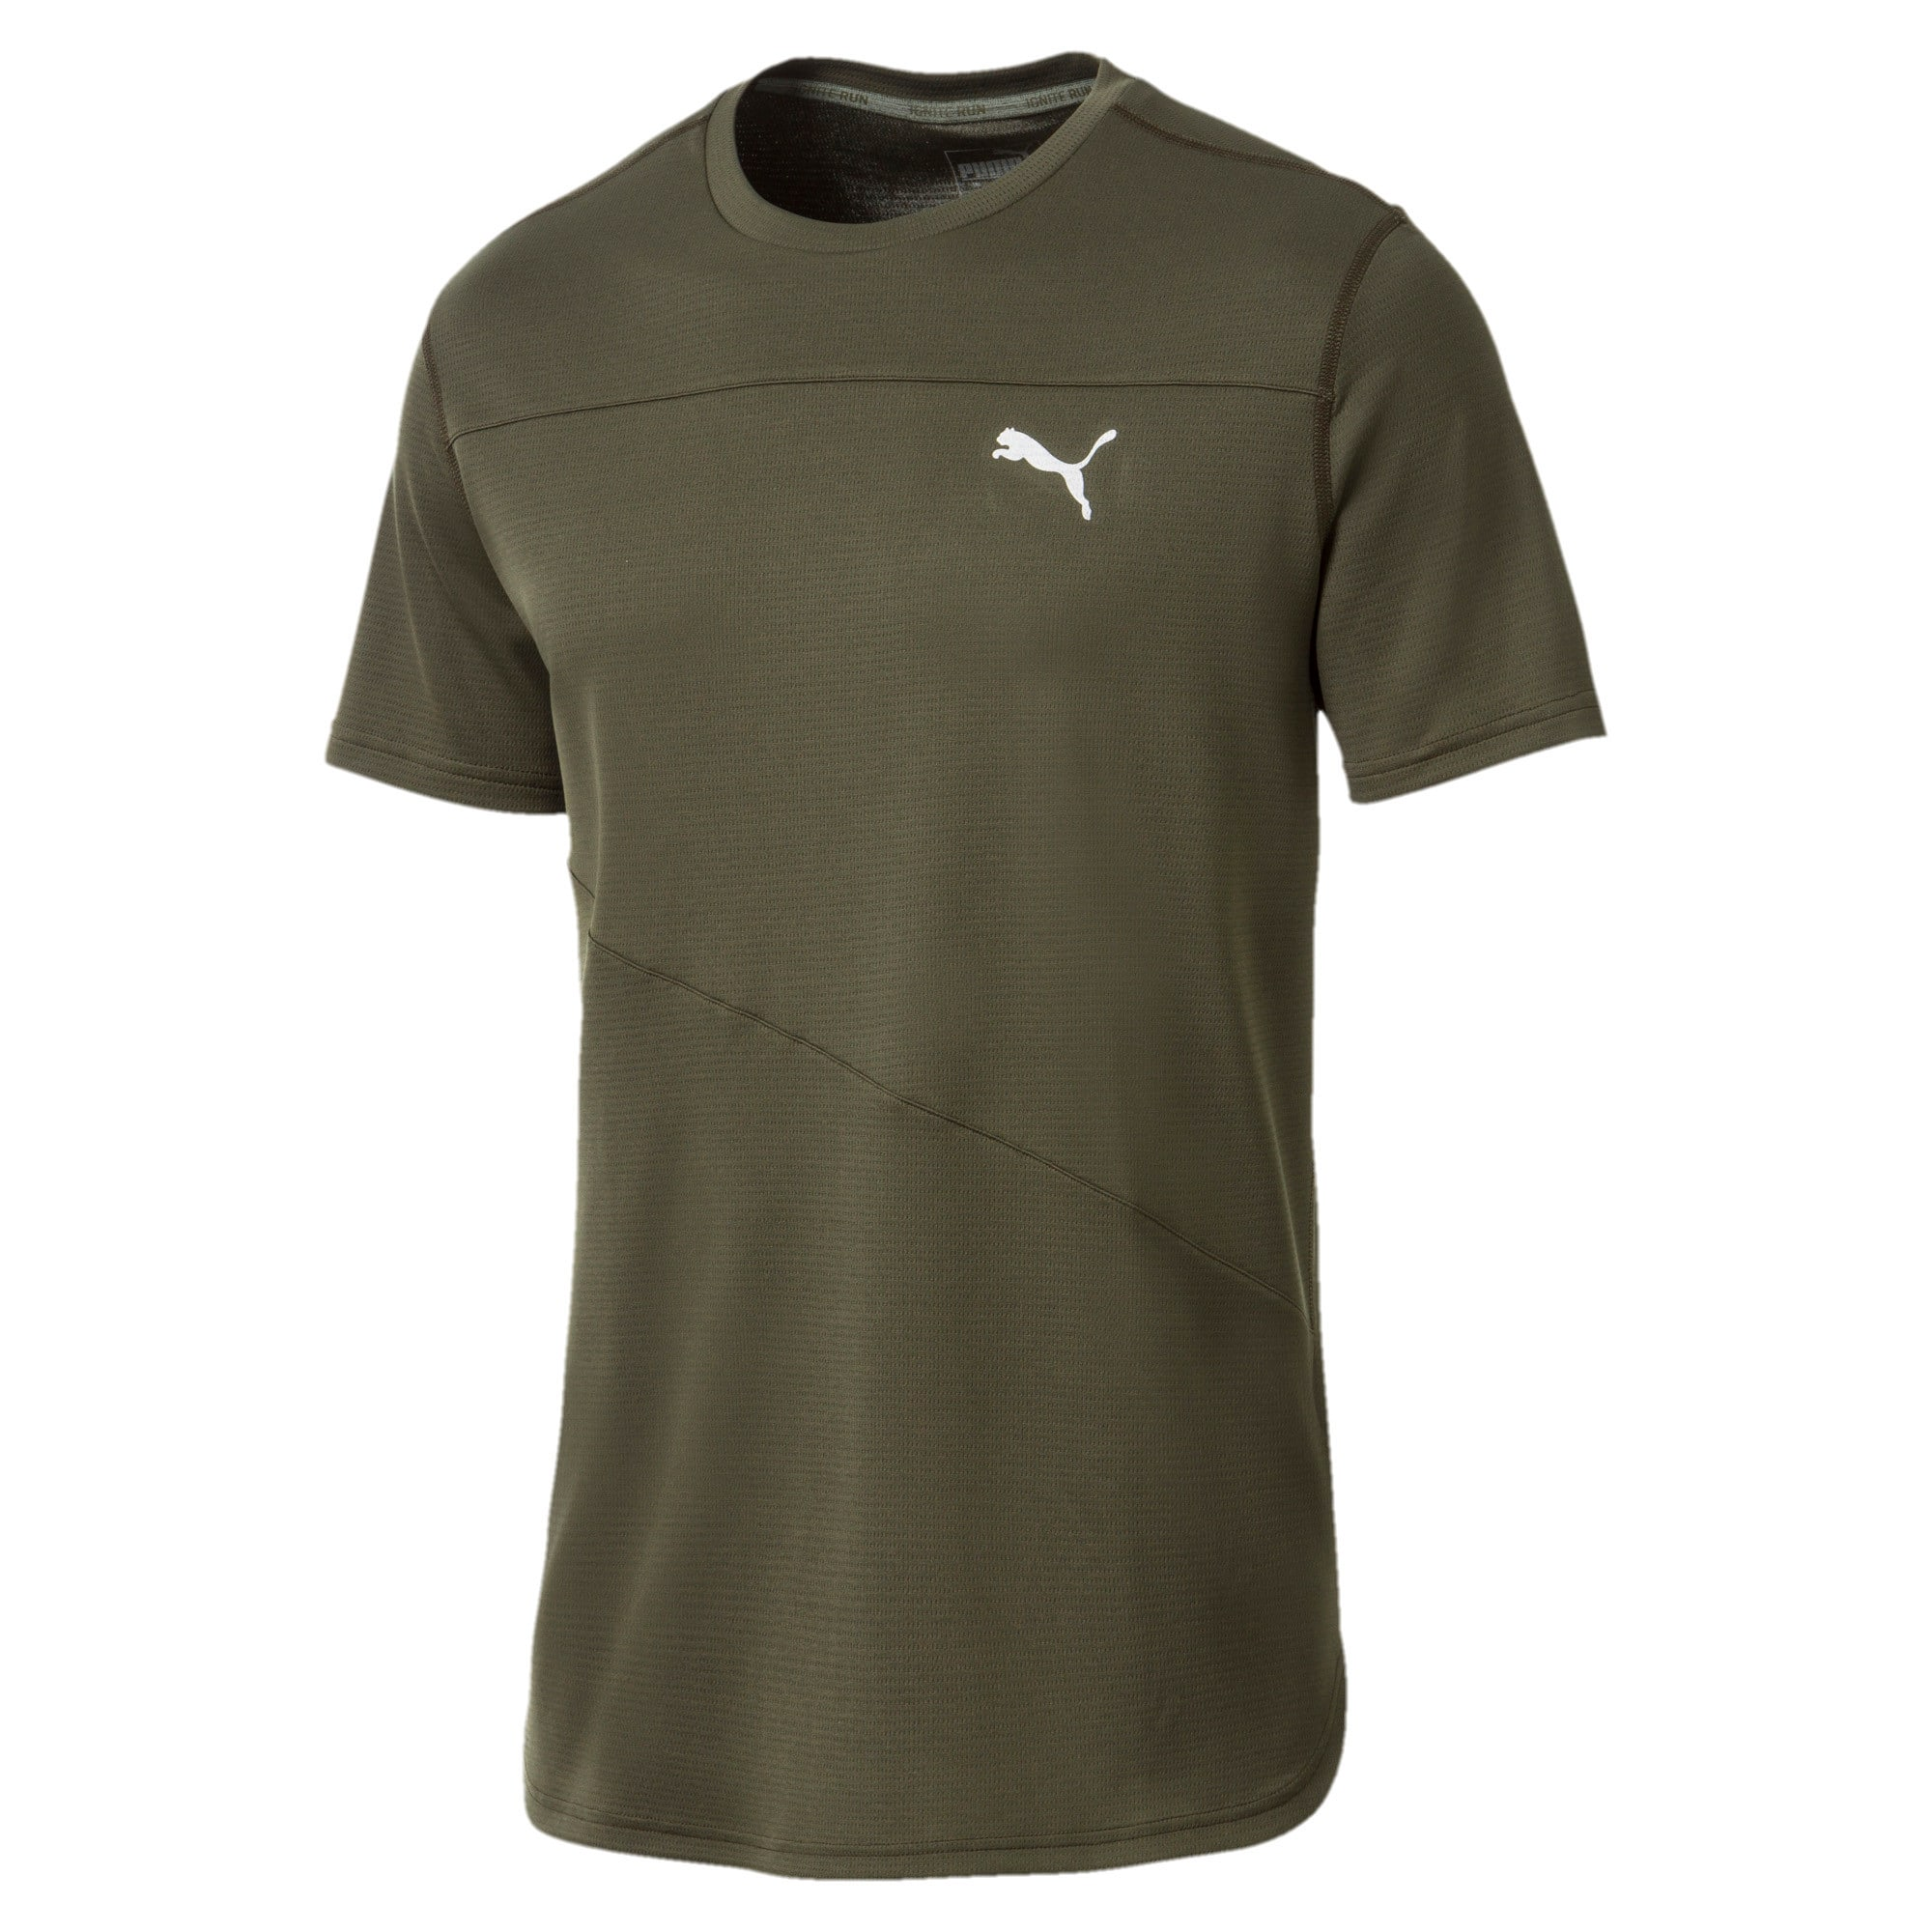 Thumbnail 4 of Running Men's IGNITE Mono T-Shirt, Forest Night, medium-IND